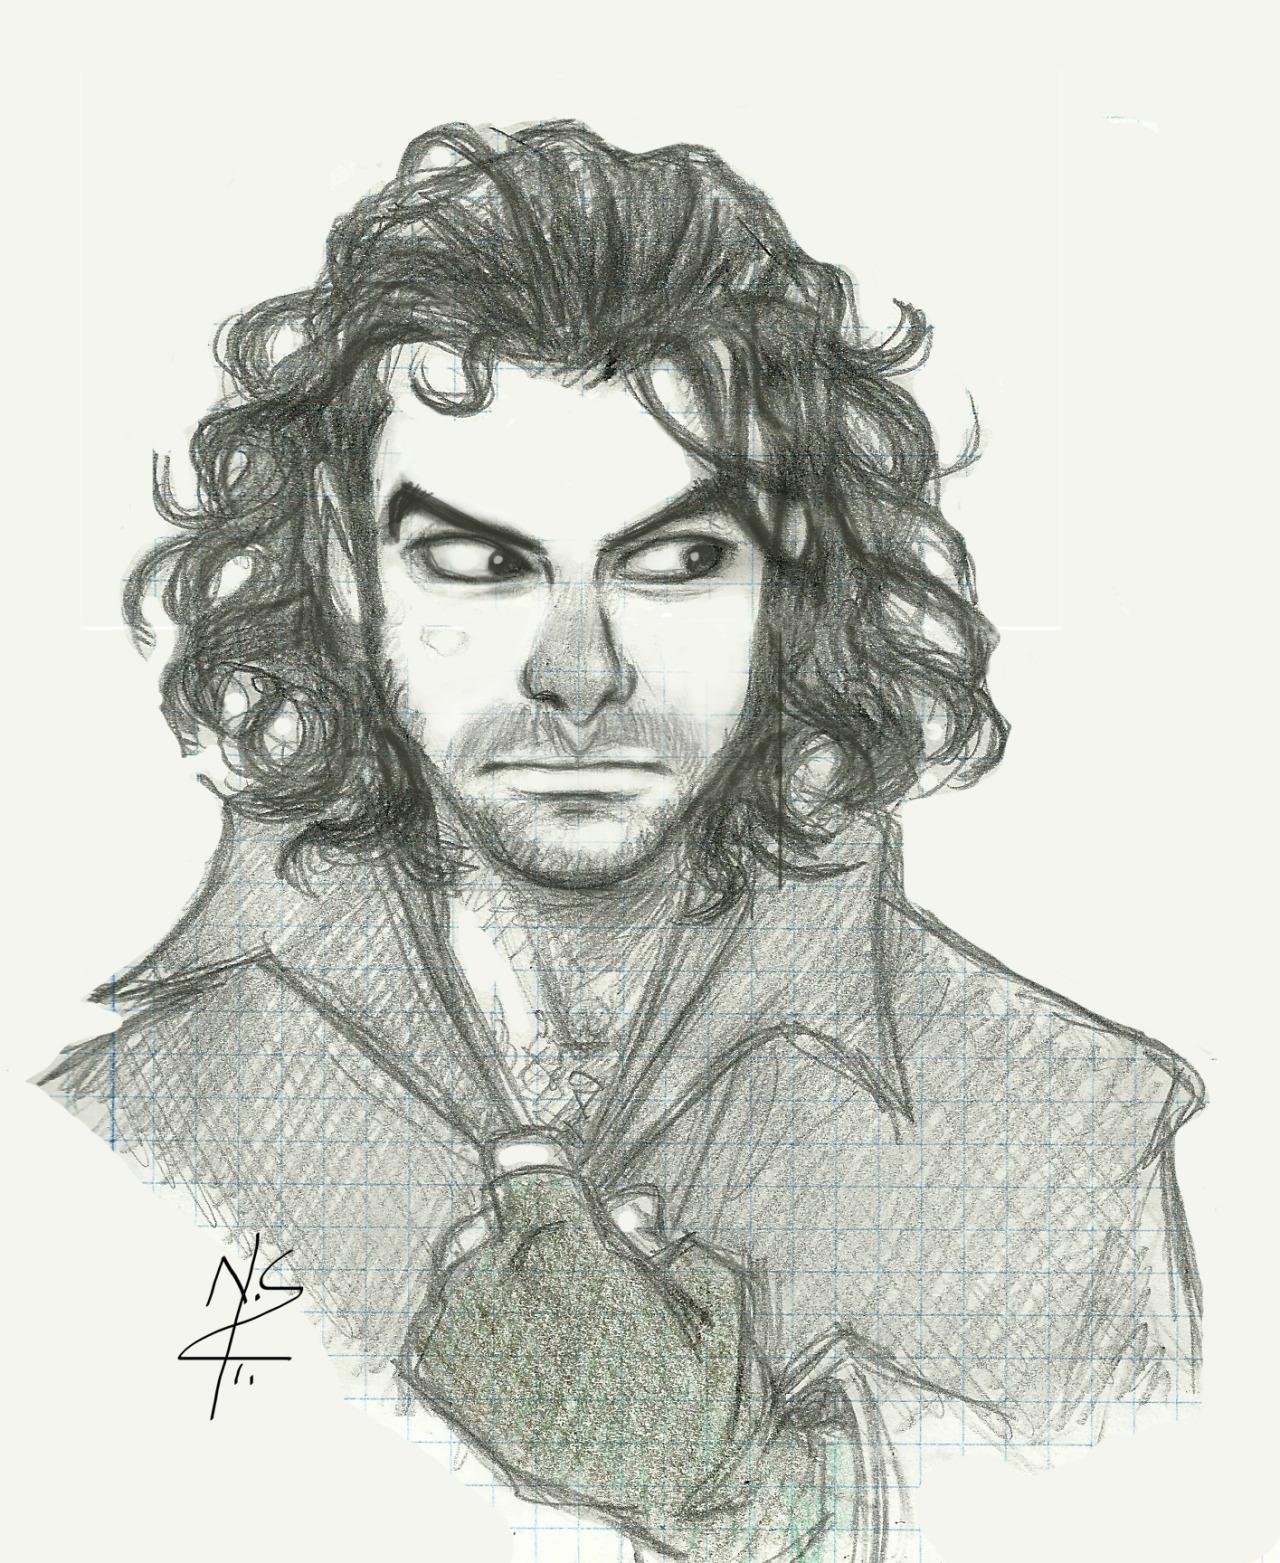 Aidan Turner #aidan turner#aidan#poldark#kili #lord if the rings #the hobbit#being human#Mitchell#vampire#fan art#fanart#drawing#dibujo#pencil#handmade#traditional art#traditional drawing